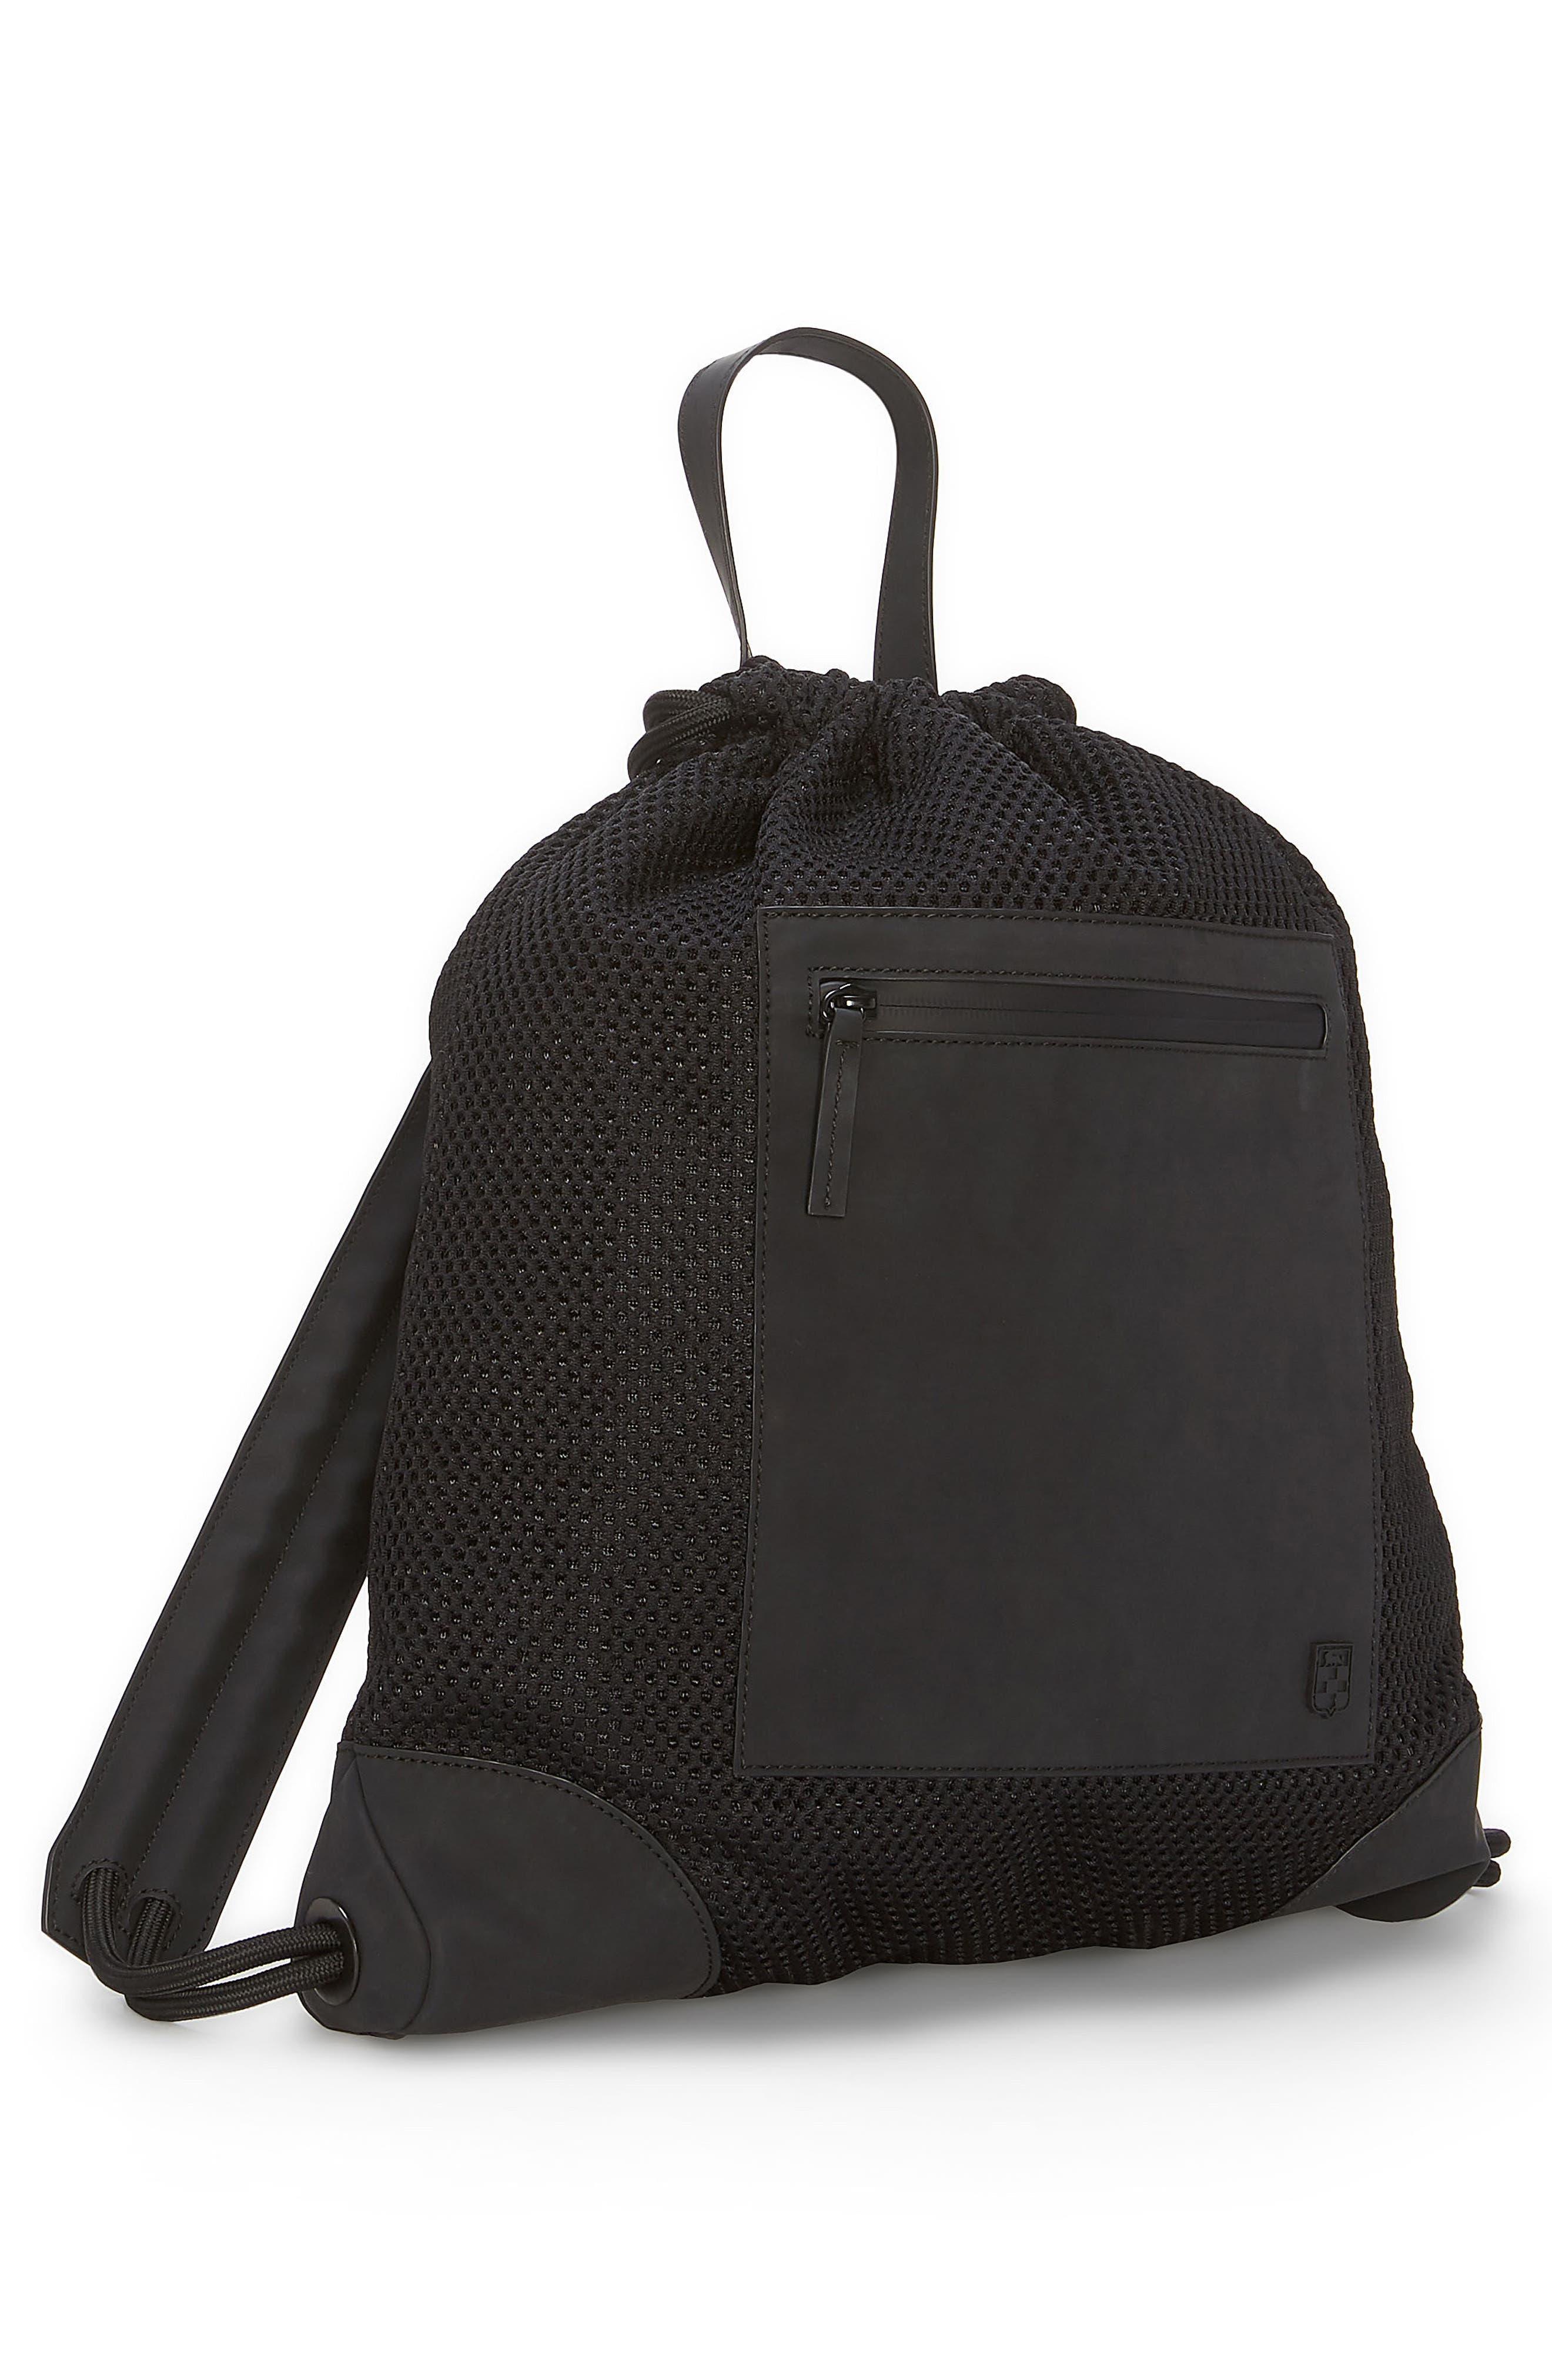 Urban Mesh Backpack,                             Alternate thumbnail 4, color,                             BLACK